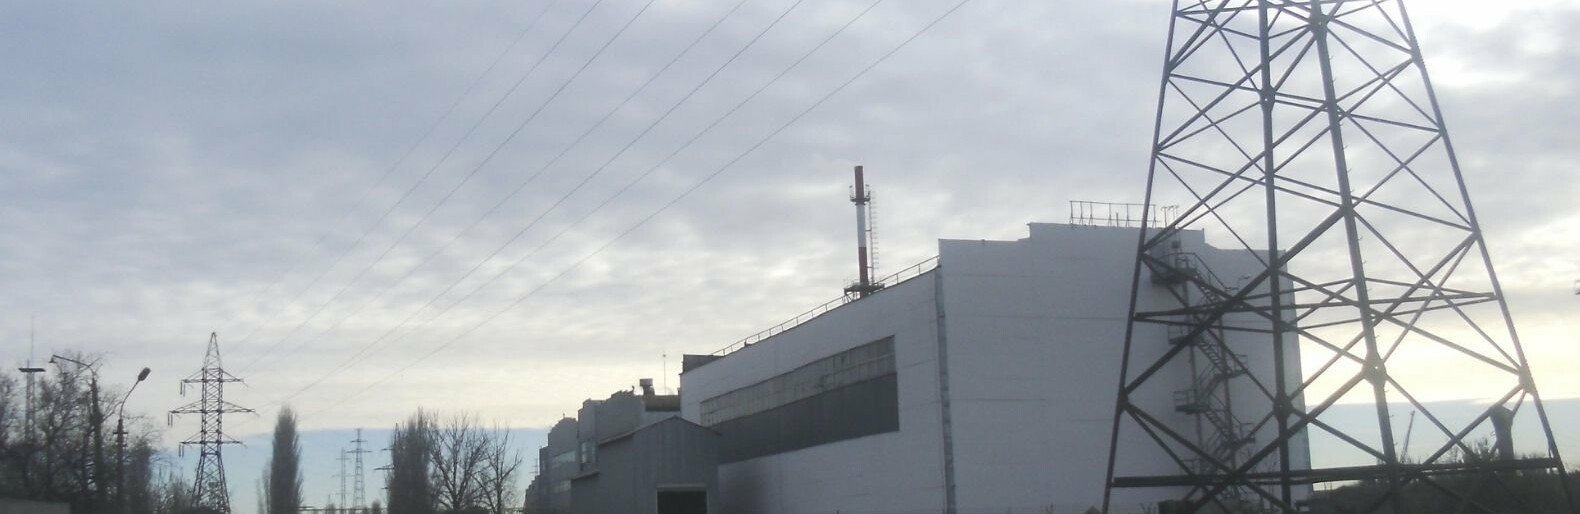 "В Николаеве на заводе ""Экотранс"" полиция изъяла документацию и назначила экспертизы,- ВИДЕО"